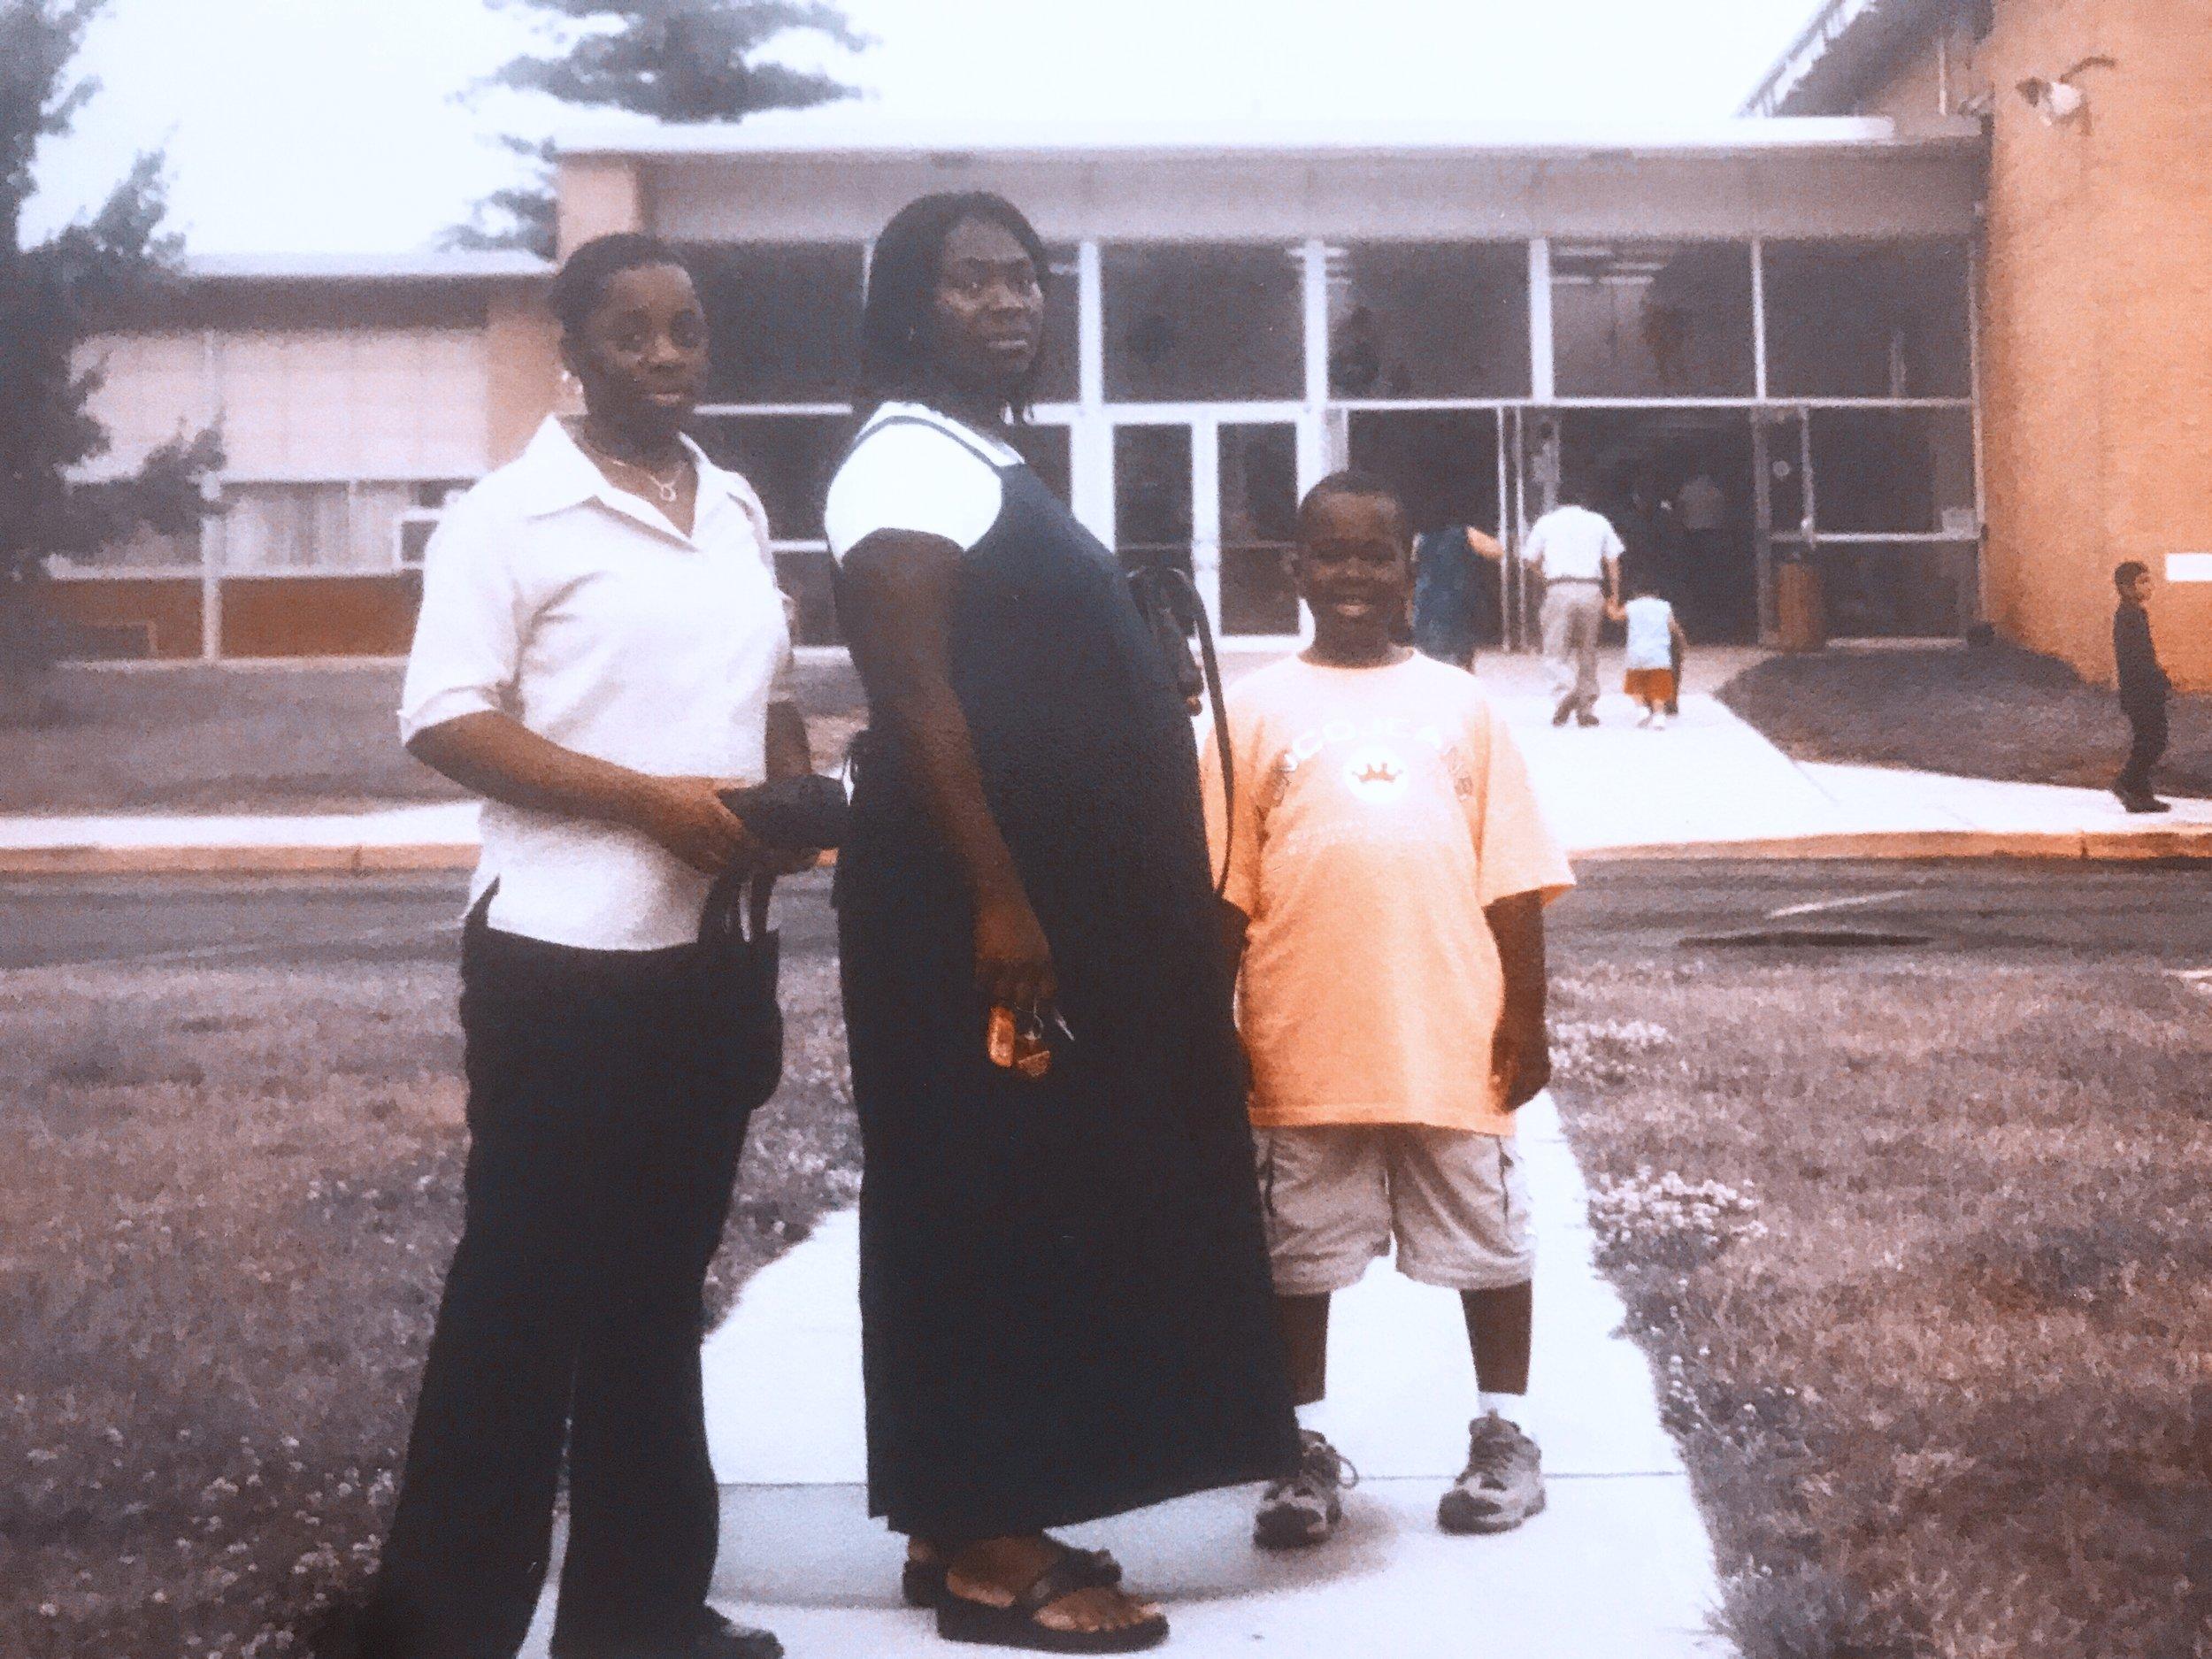 8th Grade Graduation — Sampson G. Smith. 2002.